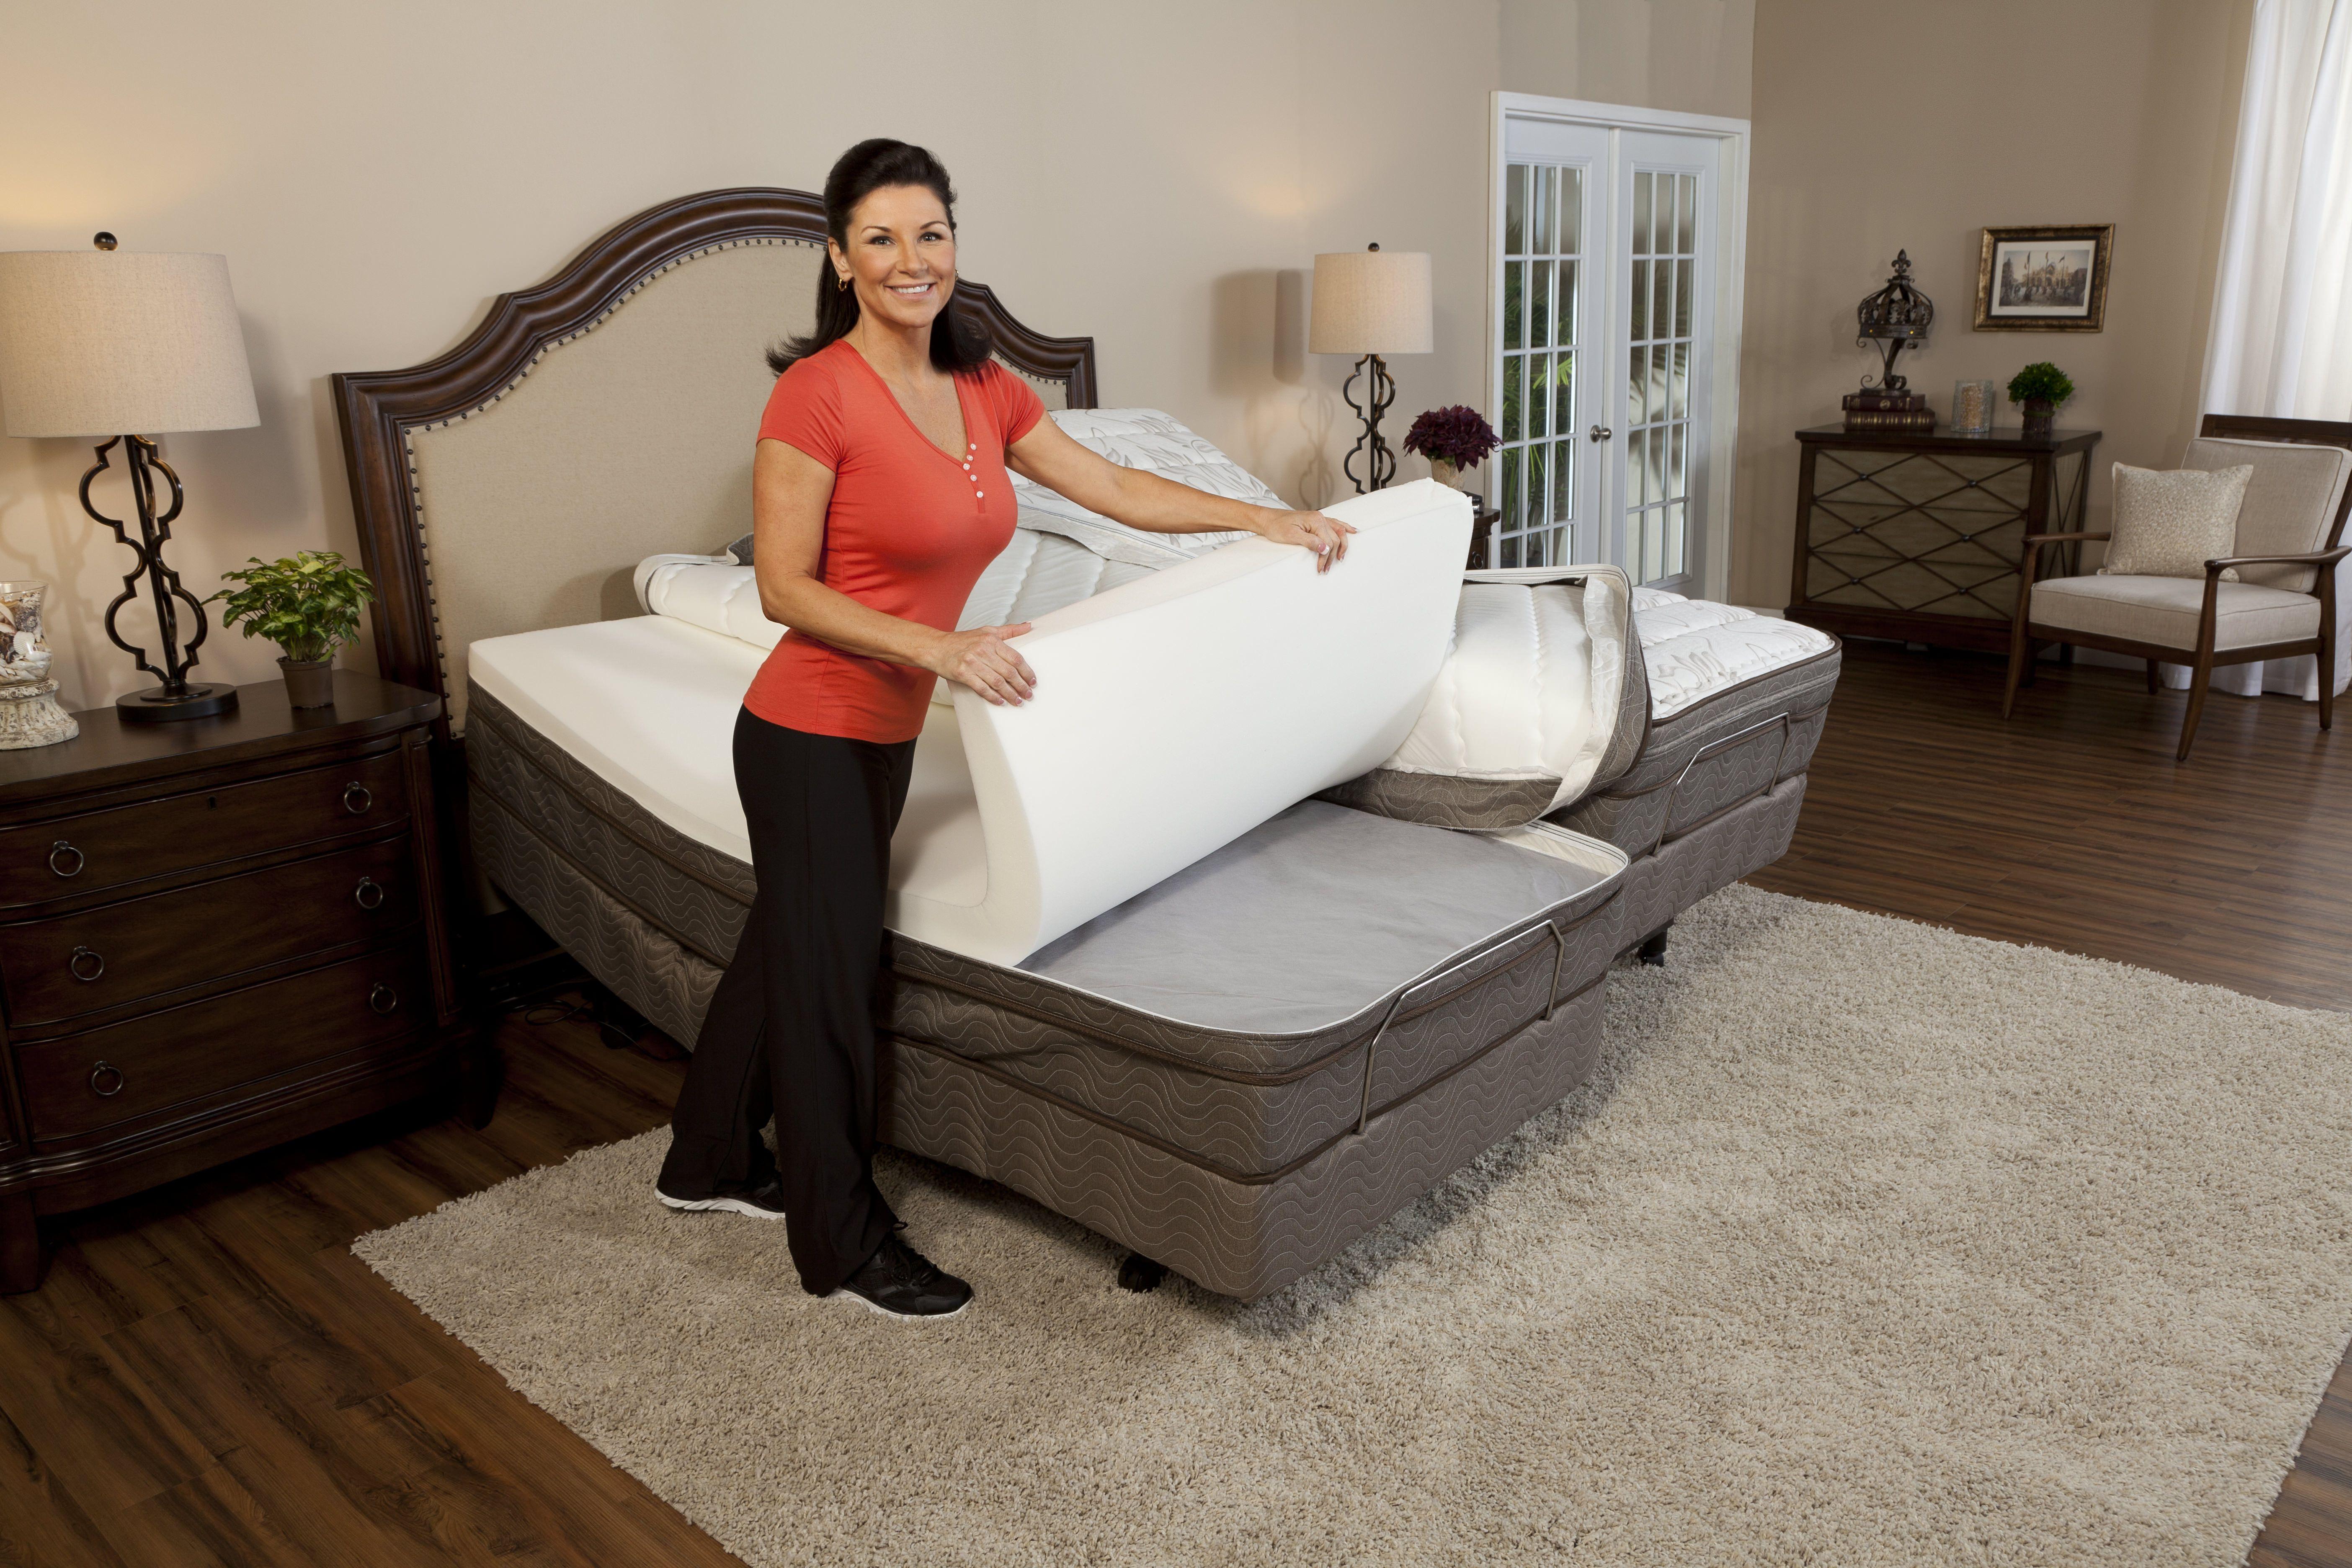 Adjustable Bed Frame, Adjustable Bed Frames, adjustable